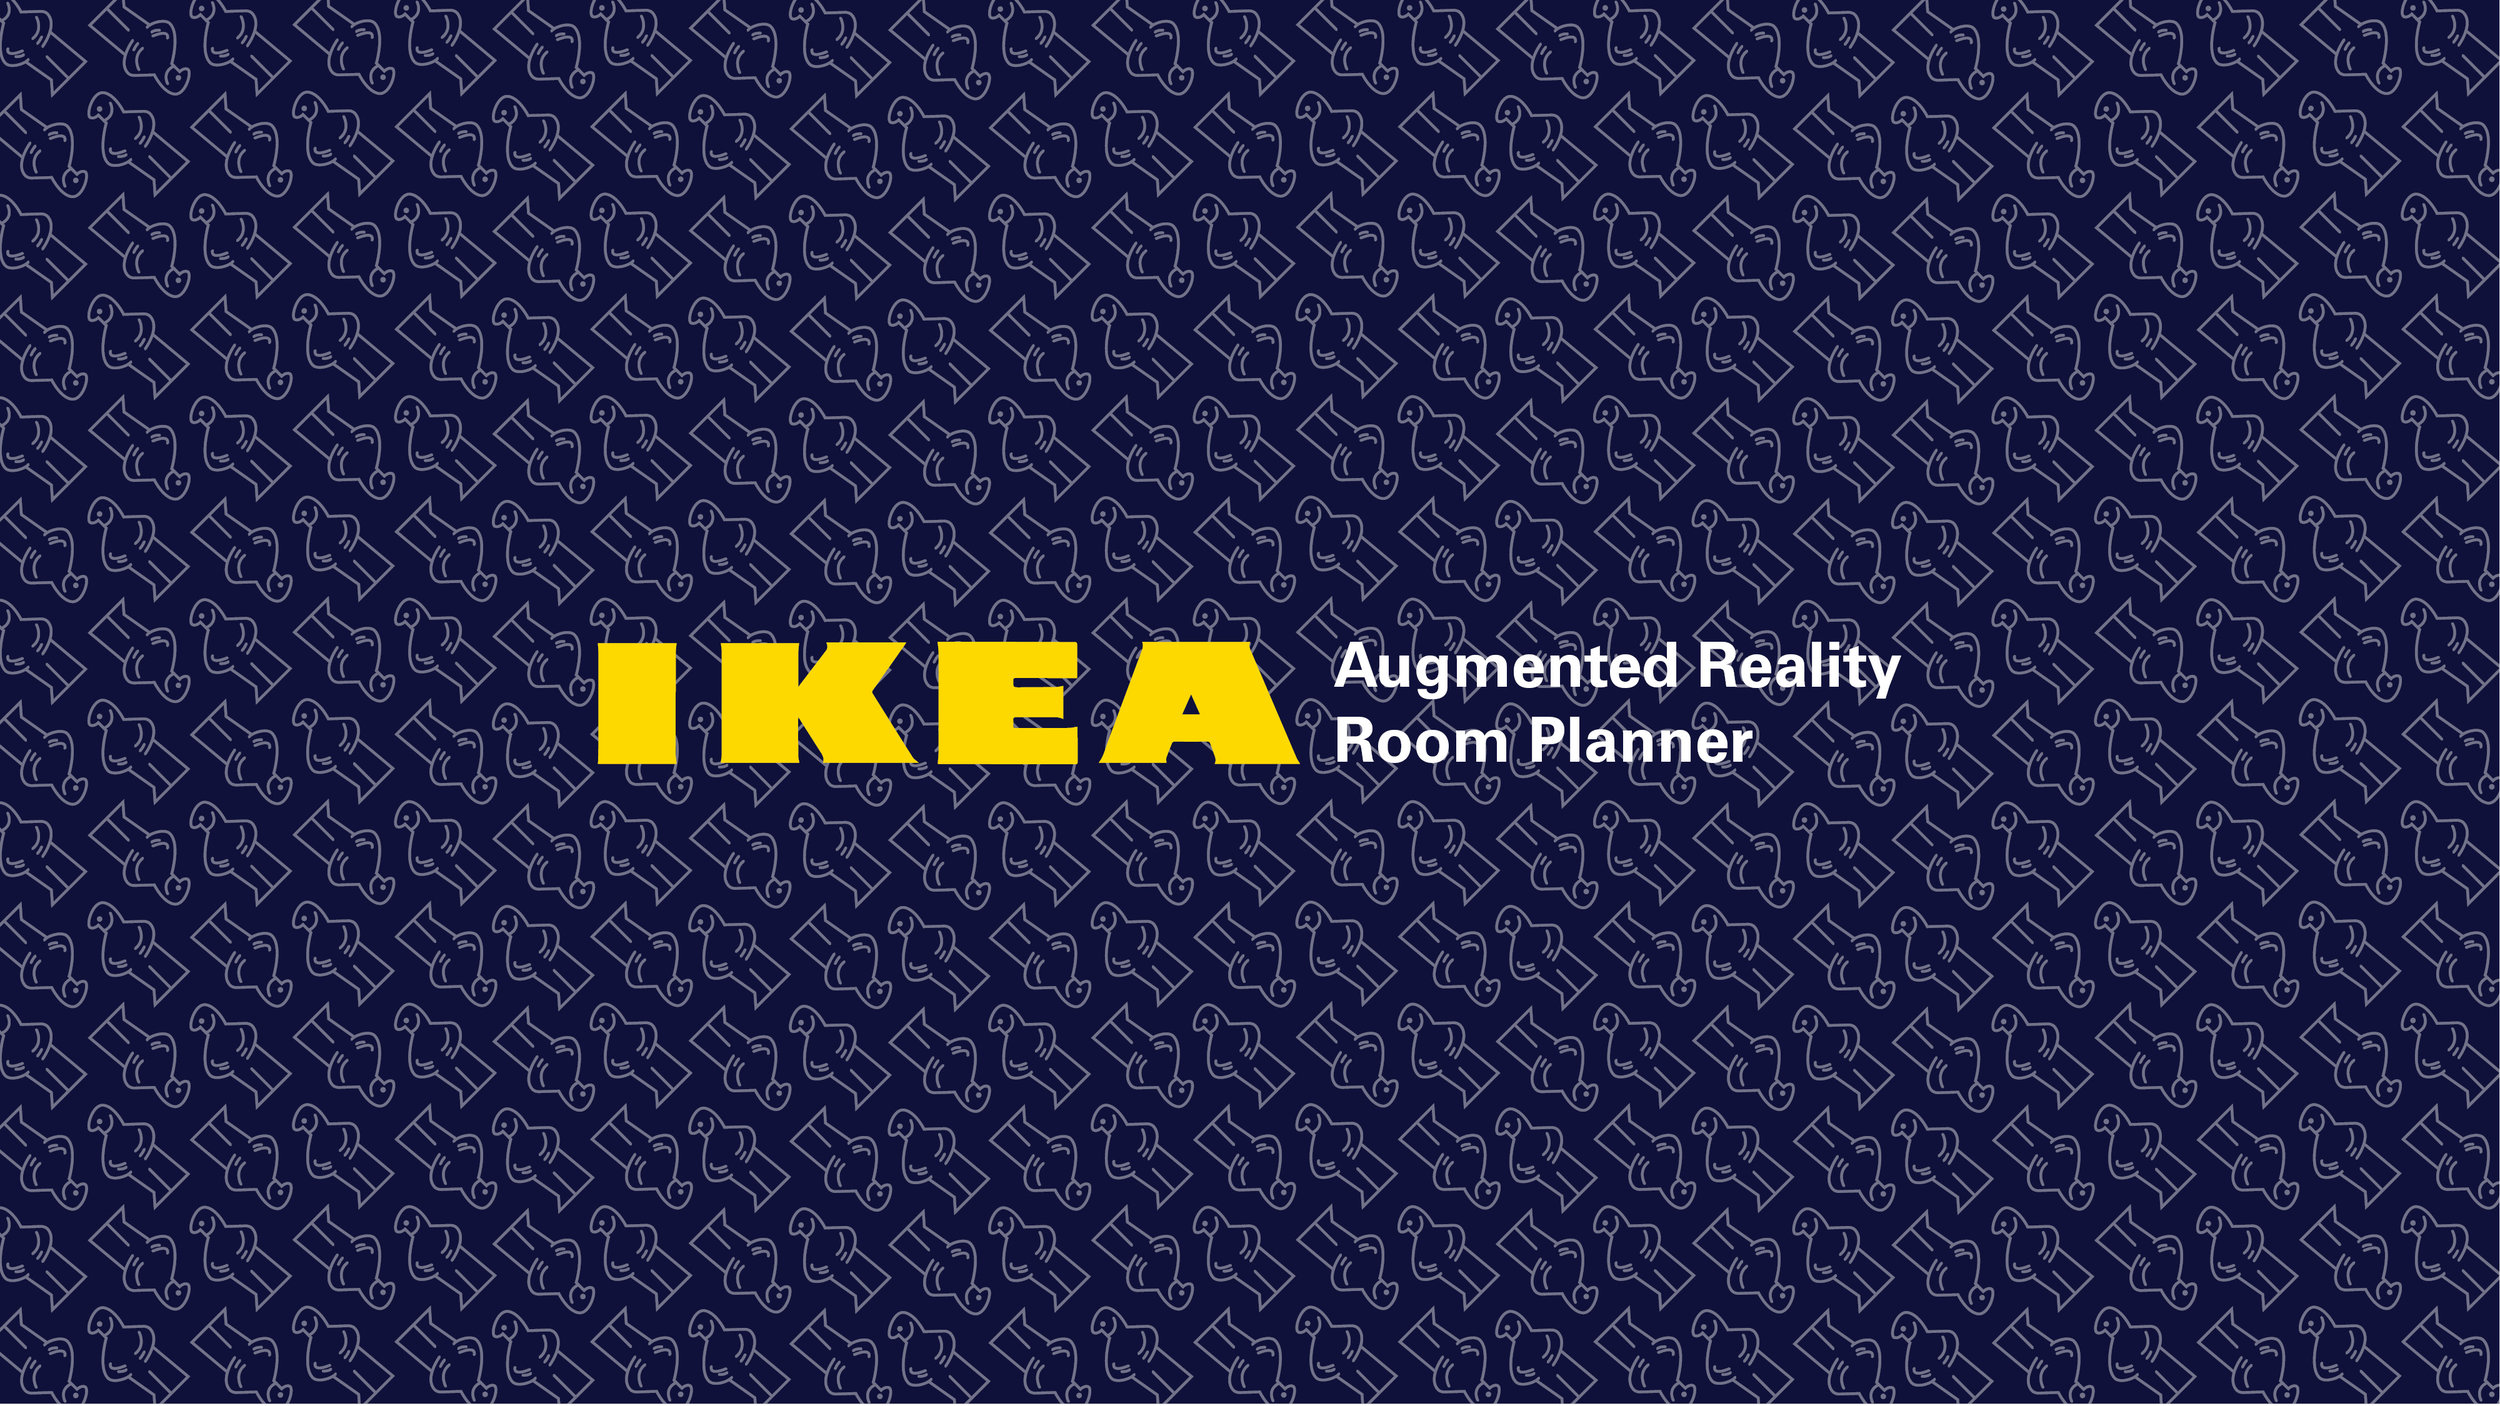 IKEA_AR_Planner_ProcessBook.jpg